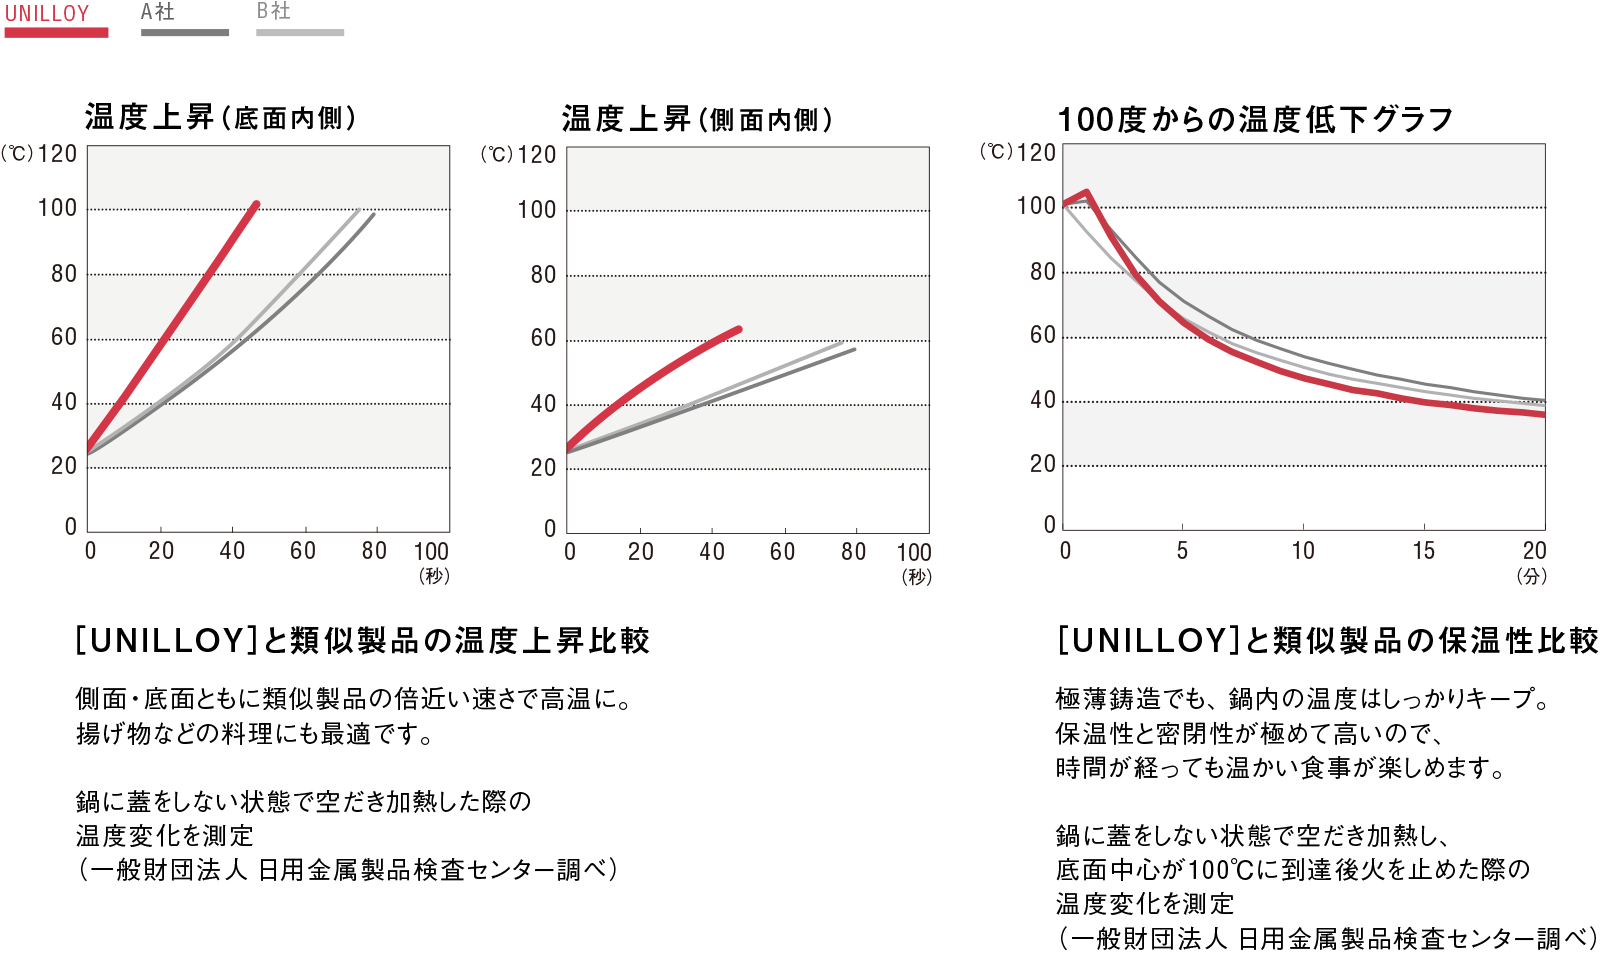 [UNILLOY]と類似製品の温度上昇比較